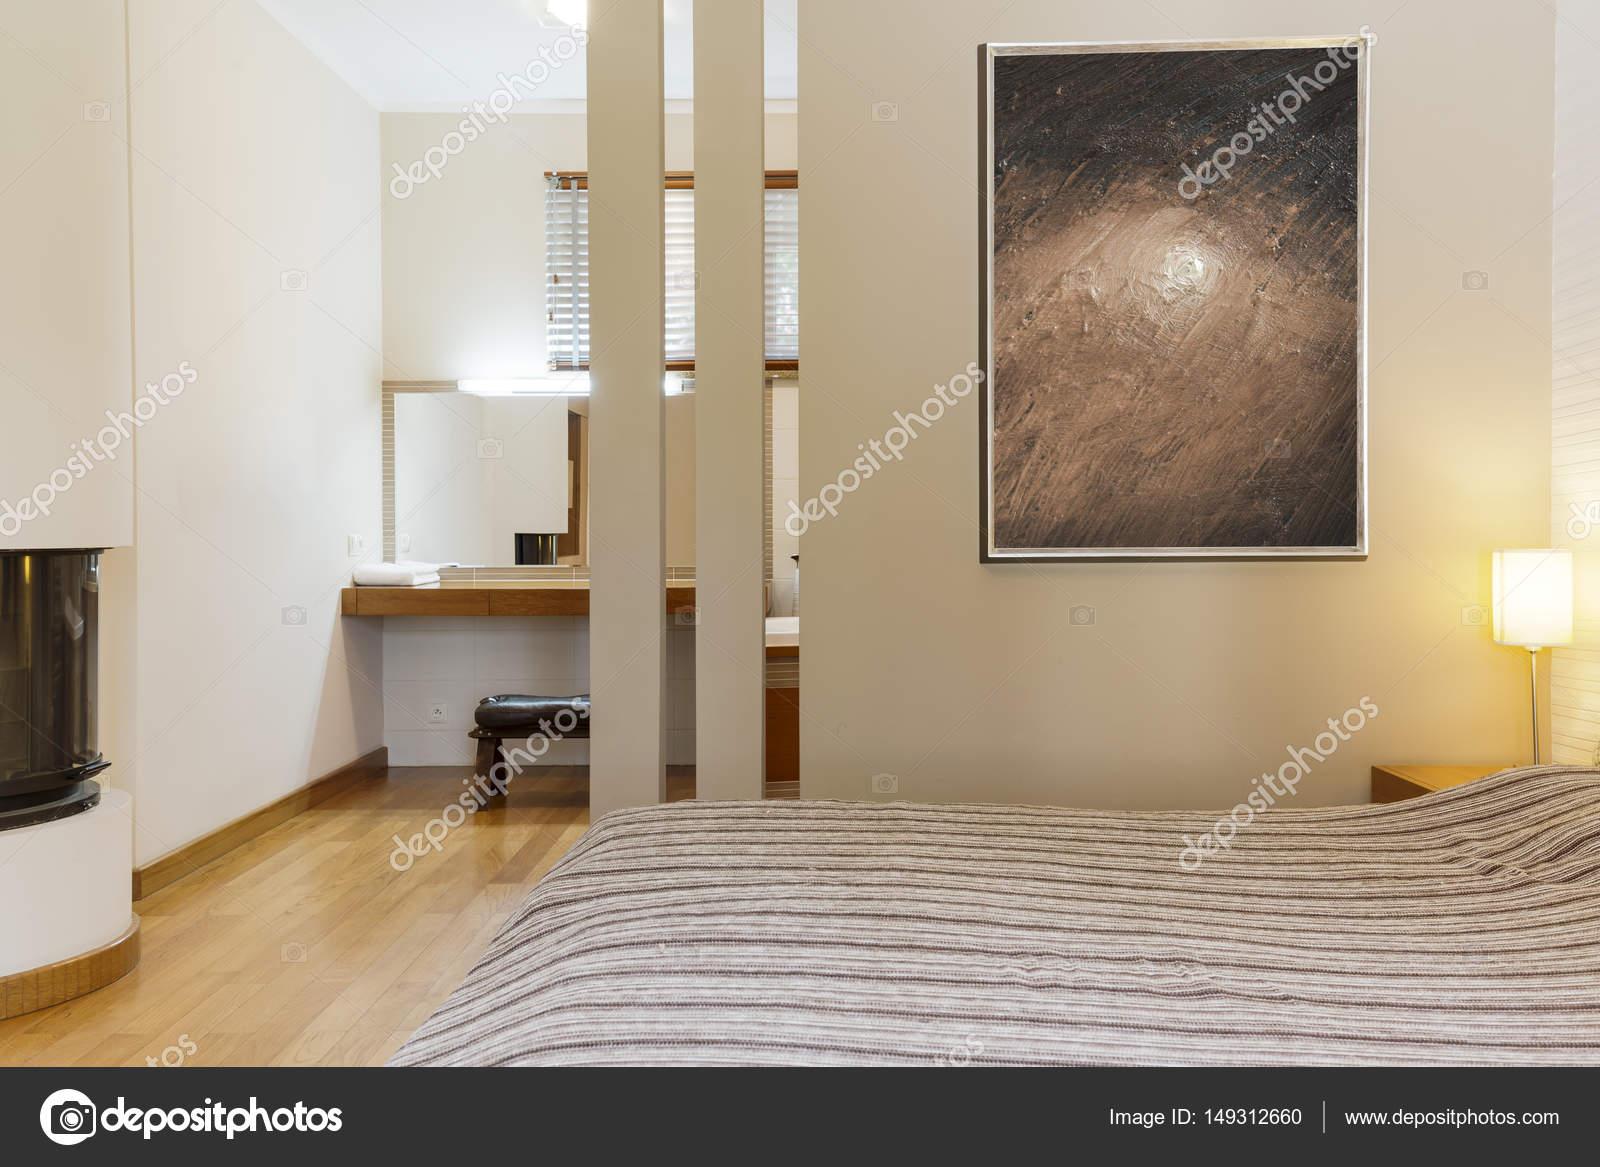 Moderne Zimmer In Warmen Farben U2014 Stockfoto